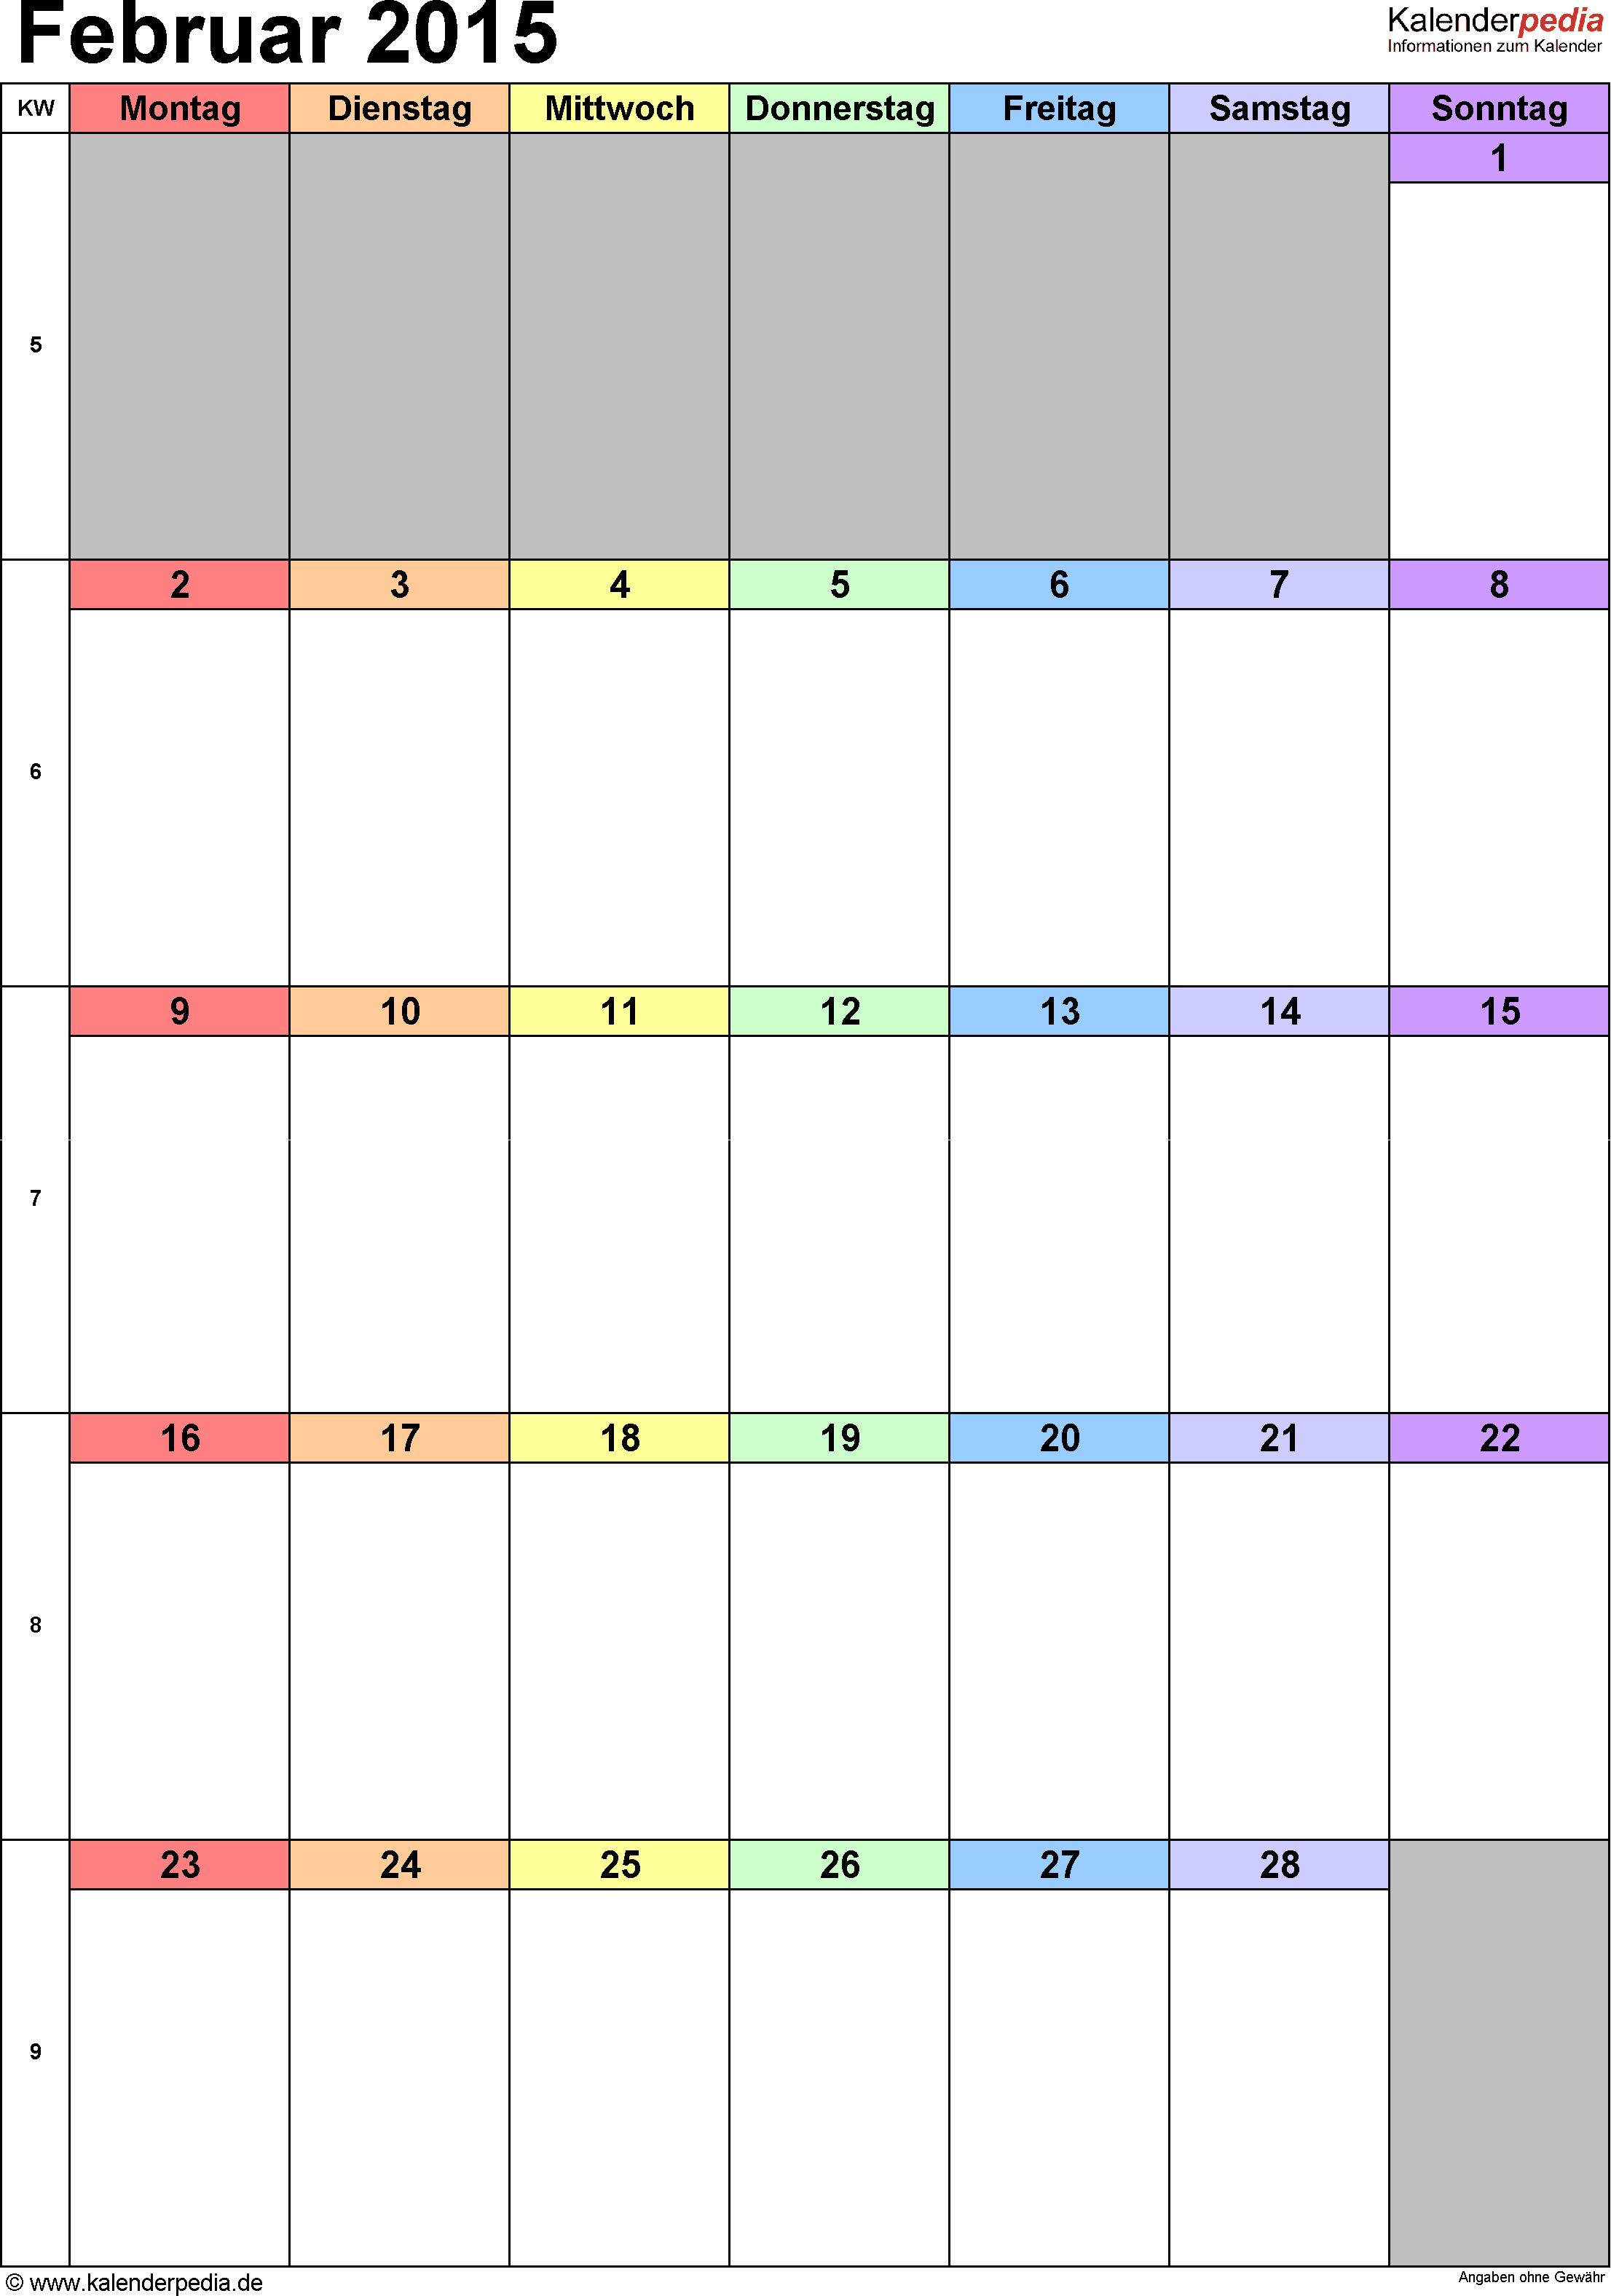 Kalender Februar 2015 (Hochformat) als Excel-Vorlage